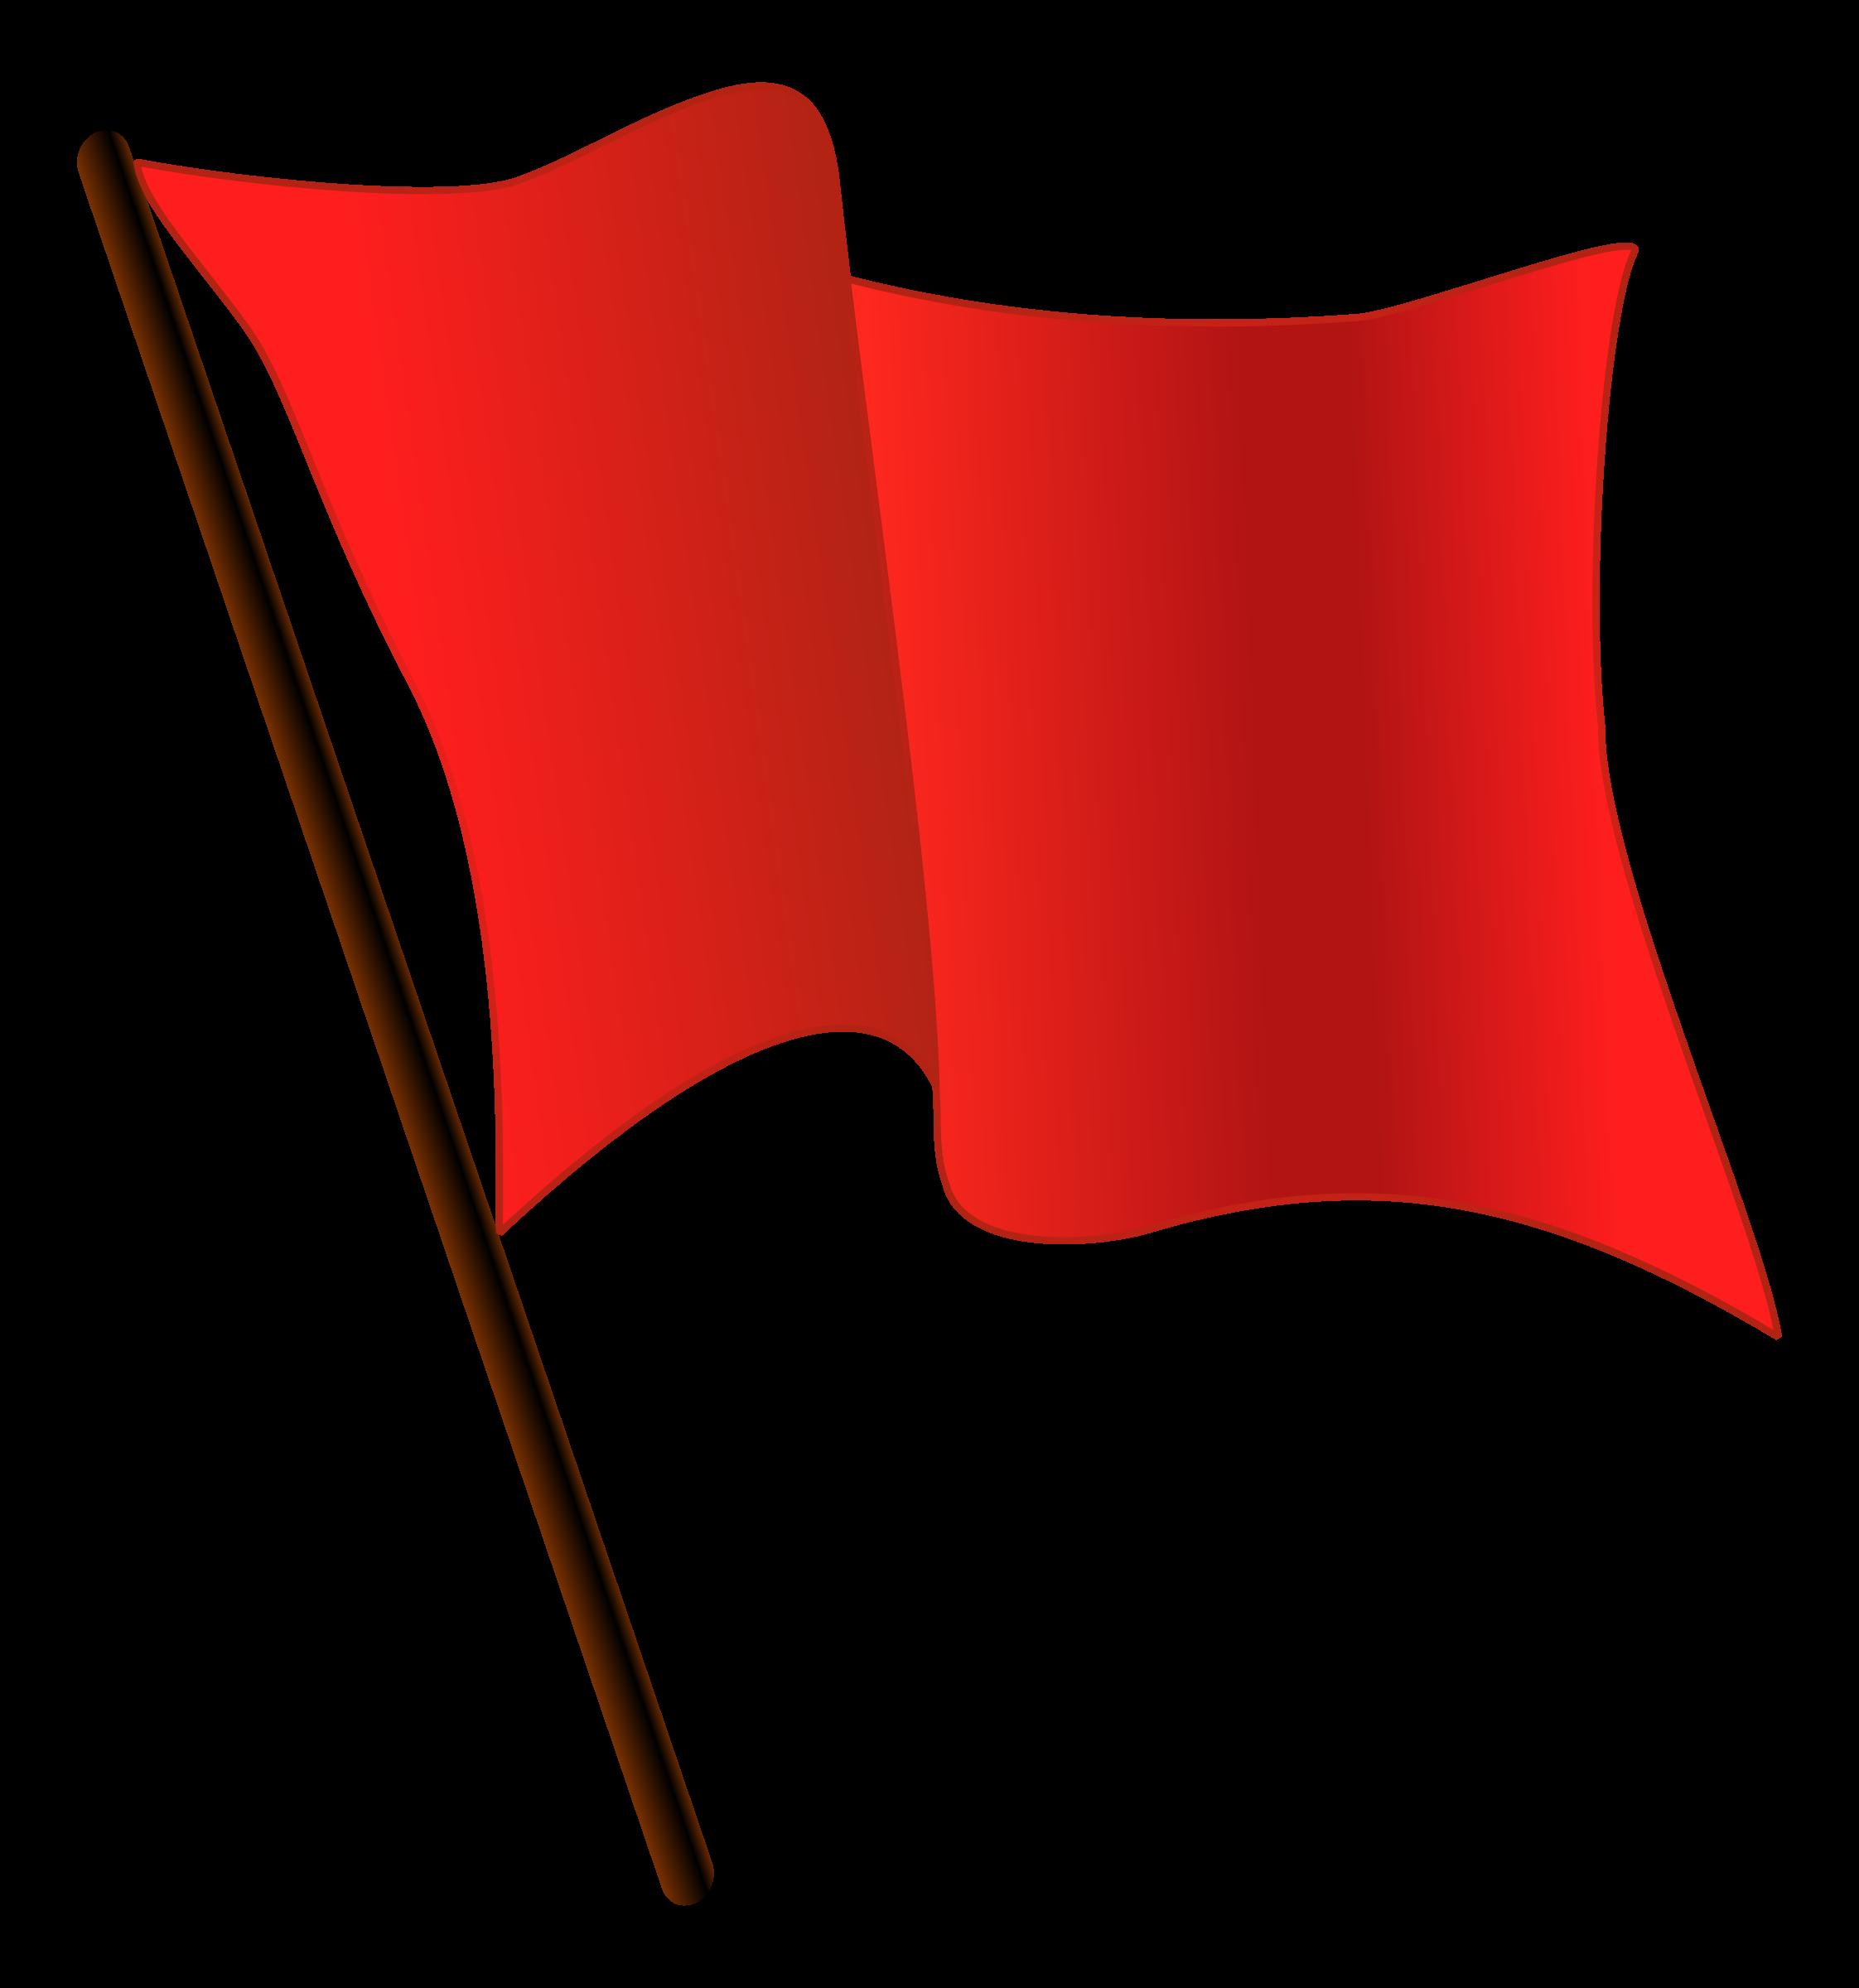 Flag clip art free. Waves clipart illustration